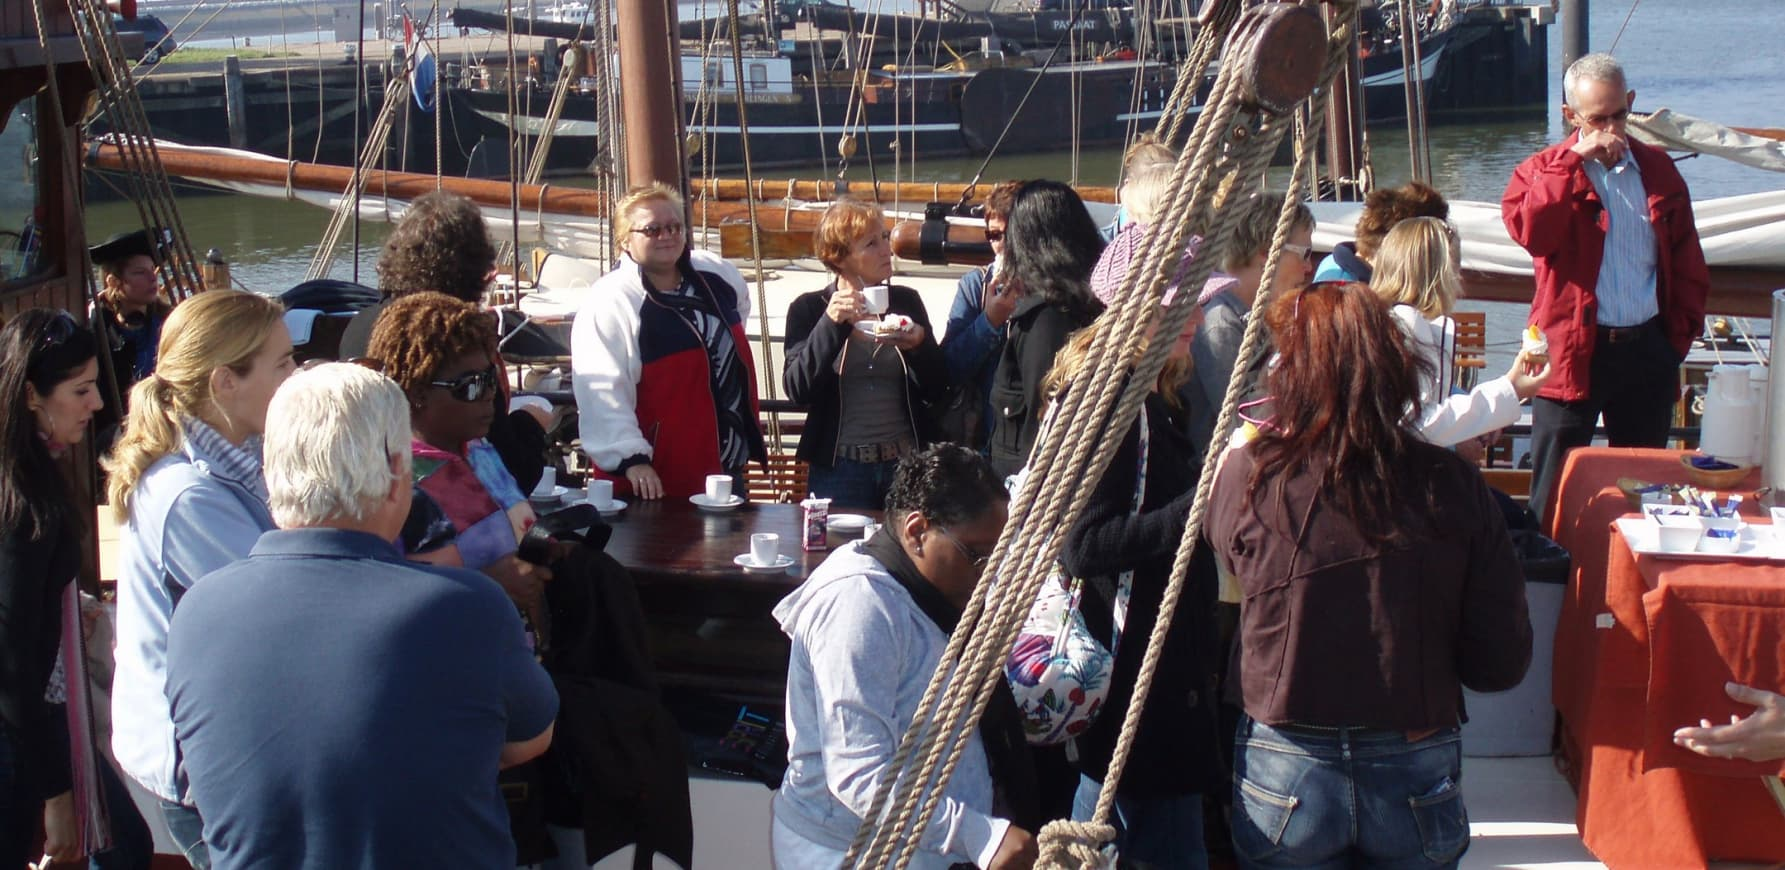 Boot feest in Friesland